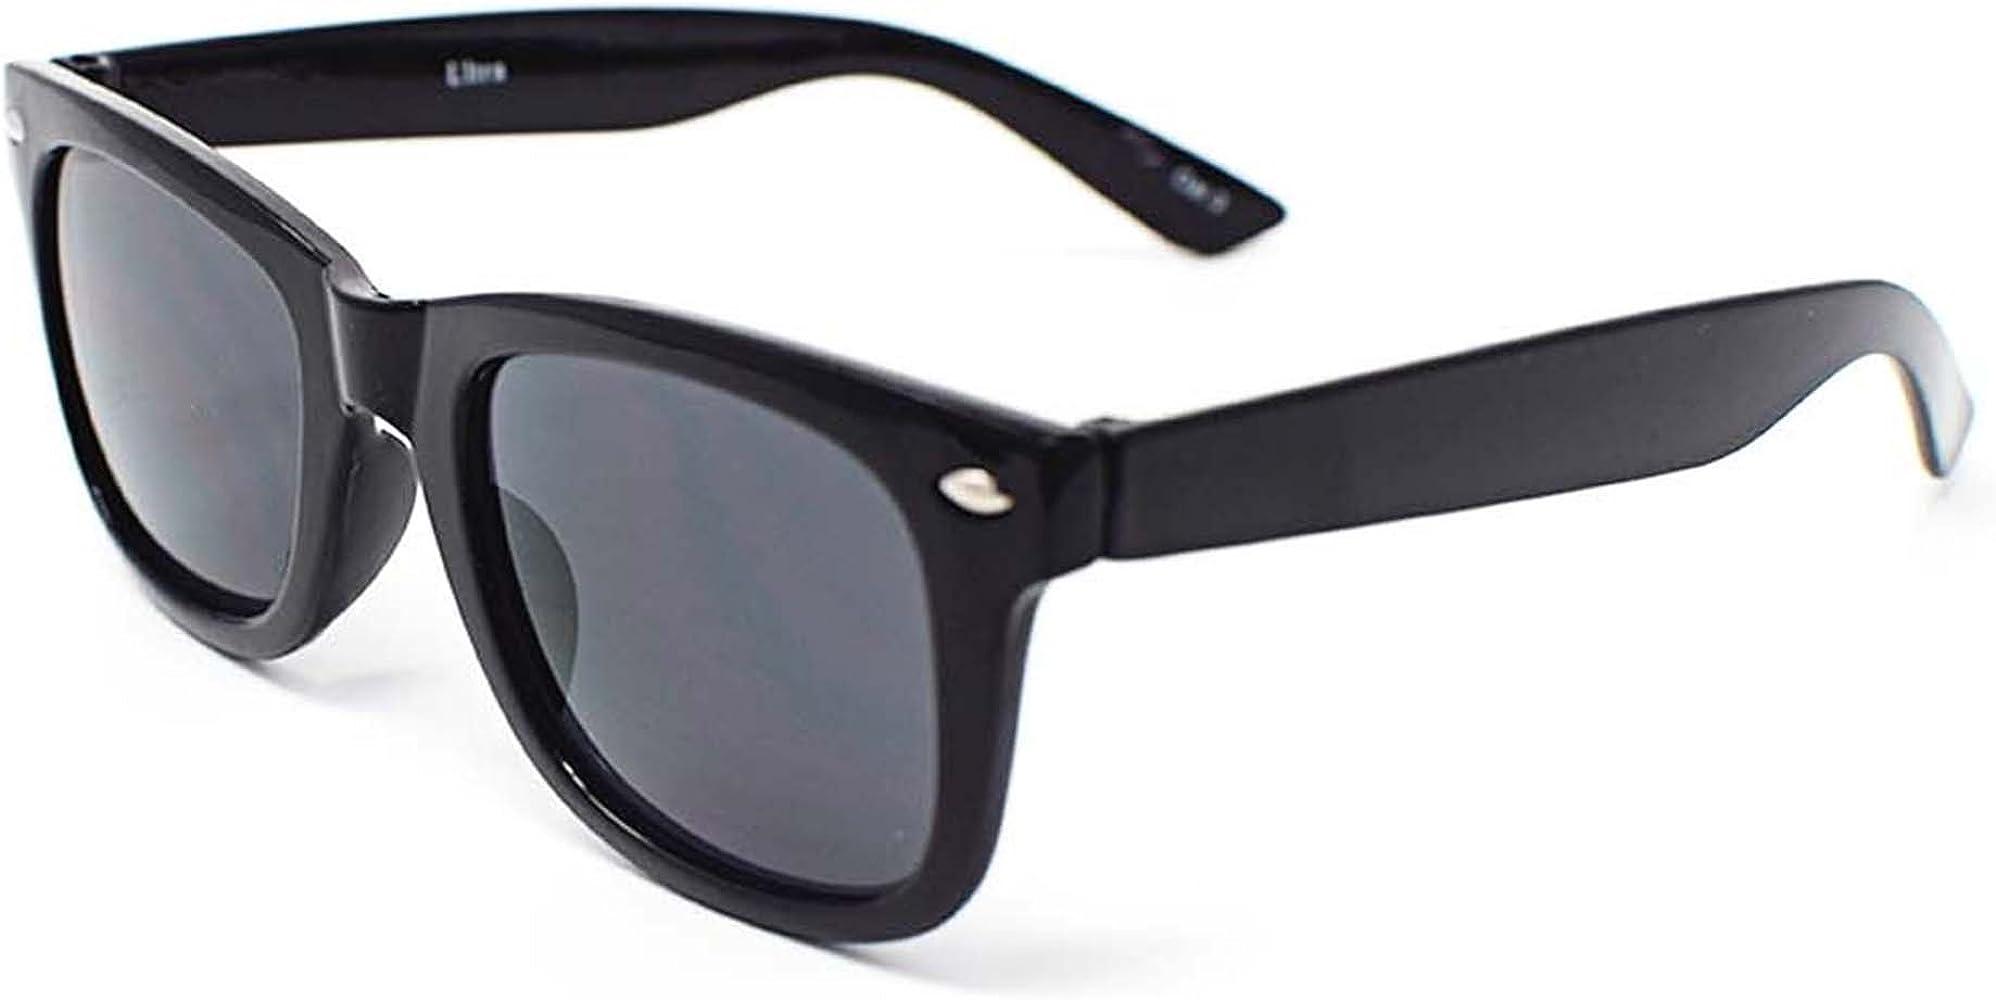 048a43abb416 Childrens Kids Classic Style Sunglasses UV400 UVA UVB Protection Shades Girls  Boys Vintage Design Vintage Design